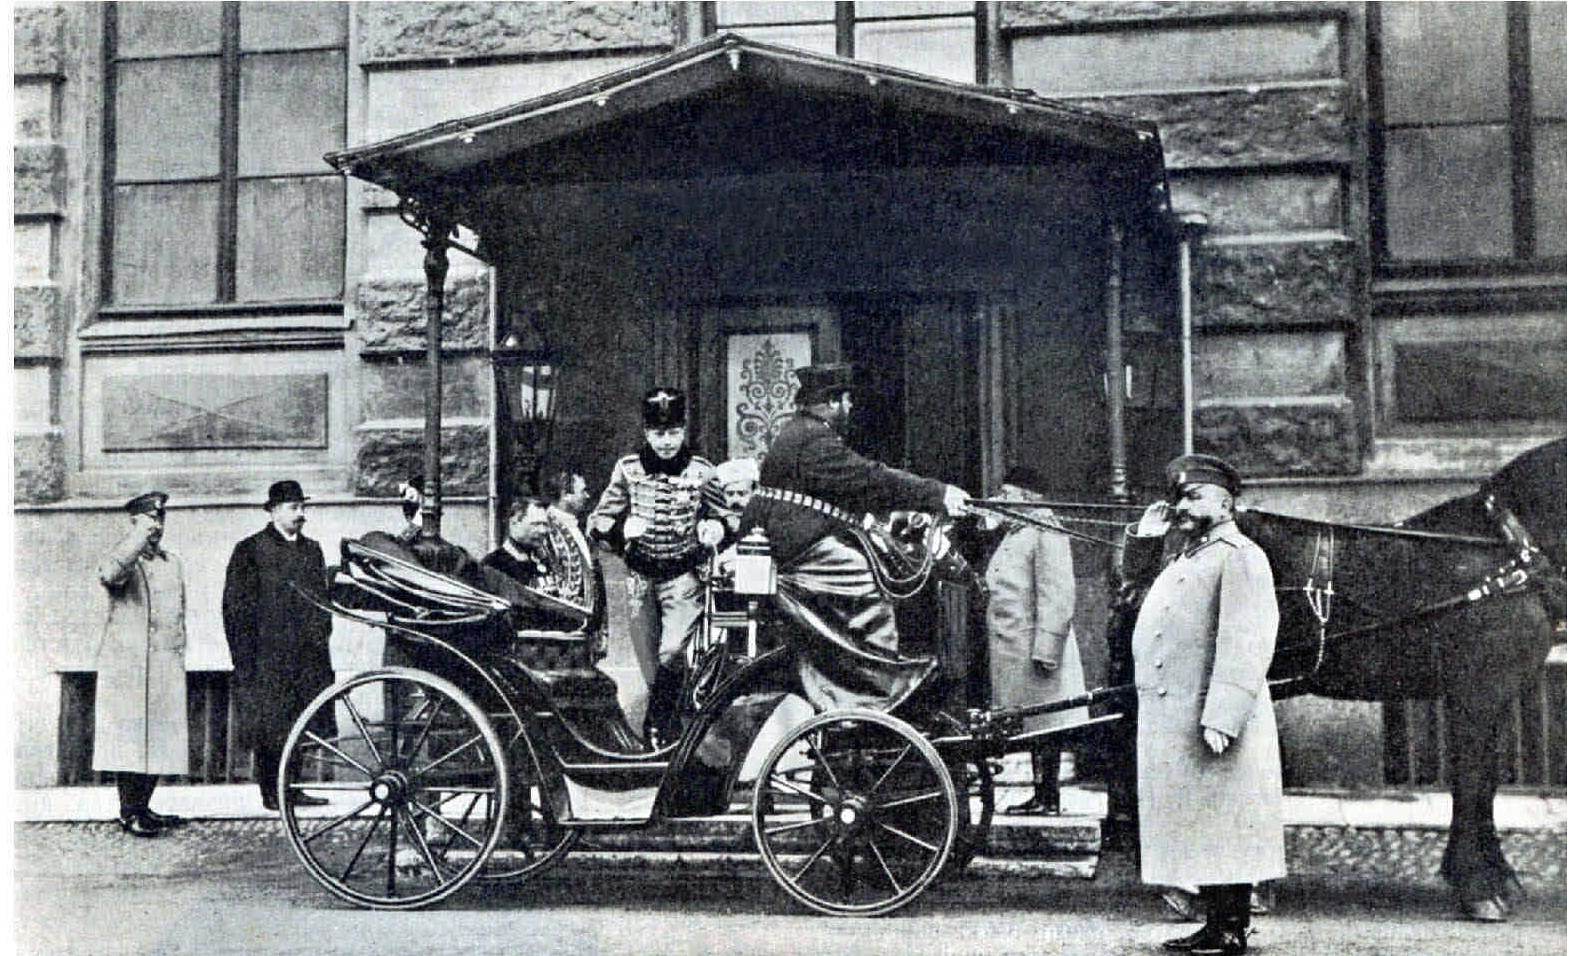 1908. Испанский инфант Дон Фернандо прибыл с визитом в Зимний дворец